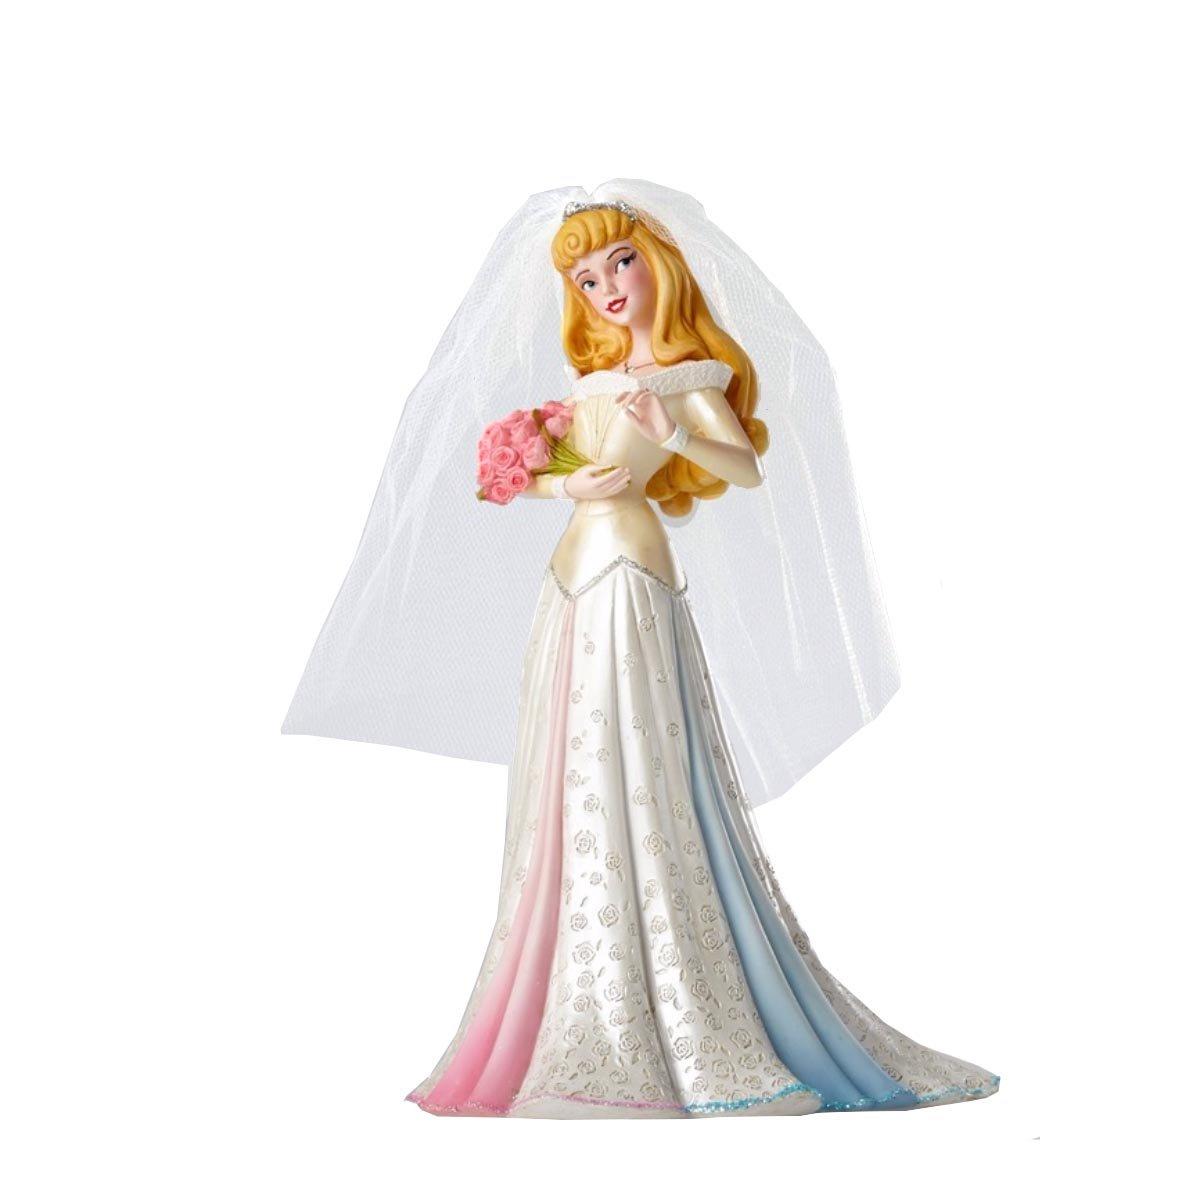 Disney Showcase Aurora Wedding Sculpture: Amazon.co.uk: Kitchen & Home